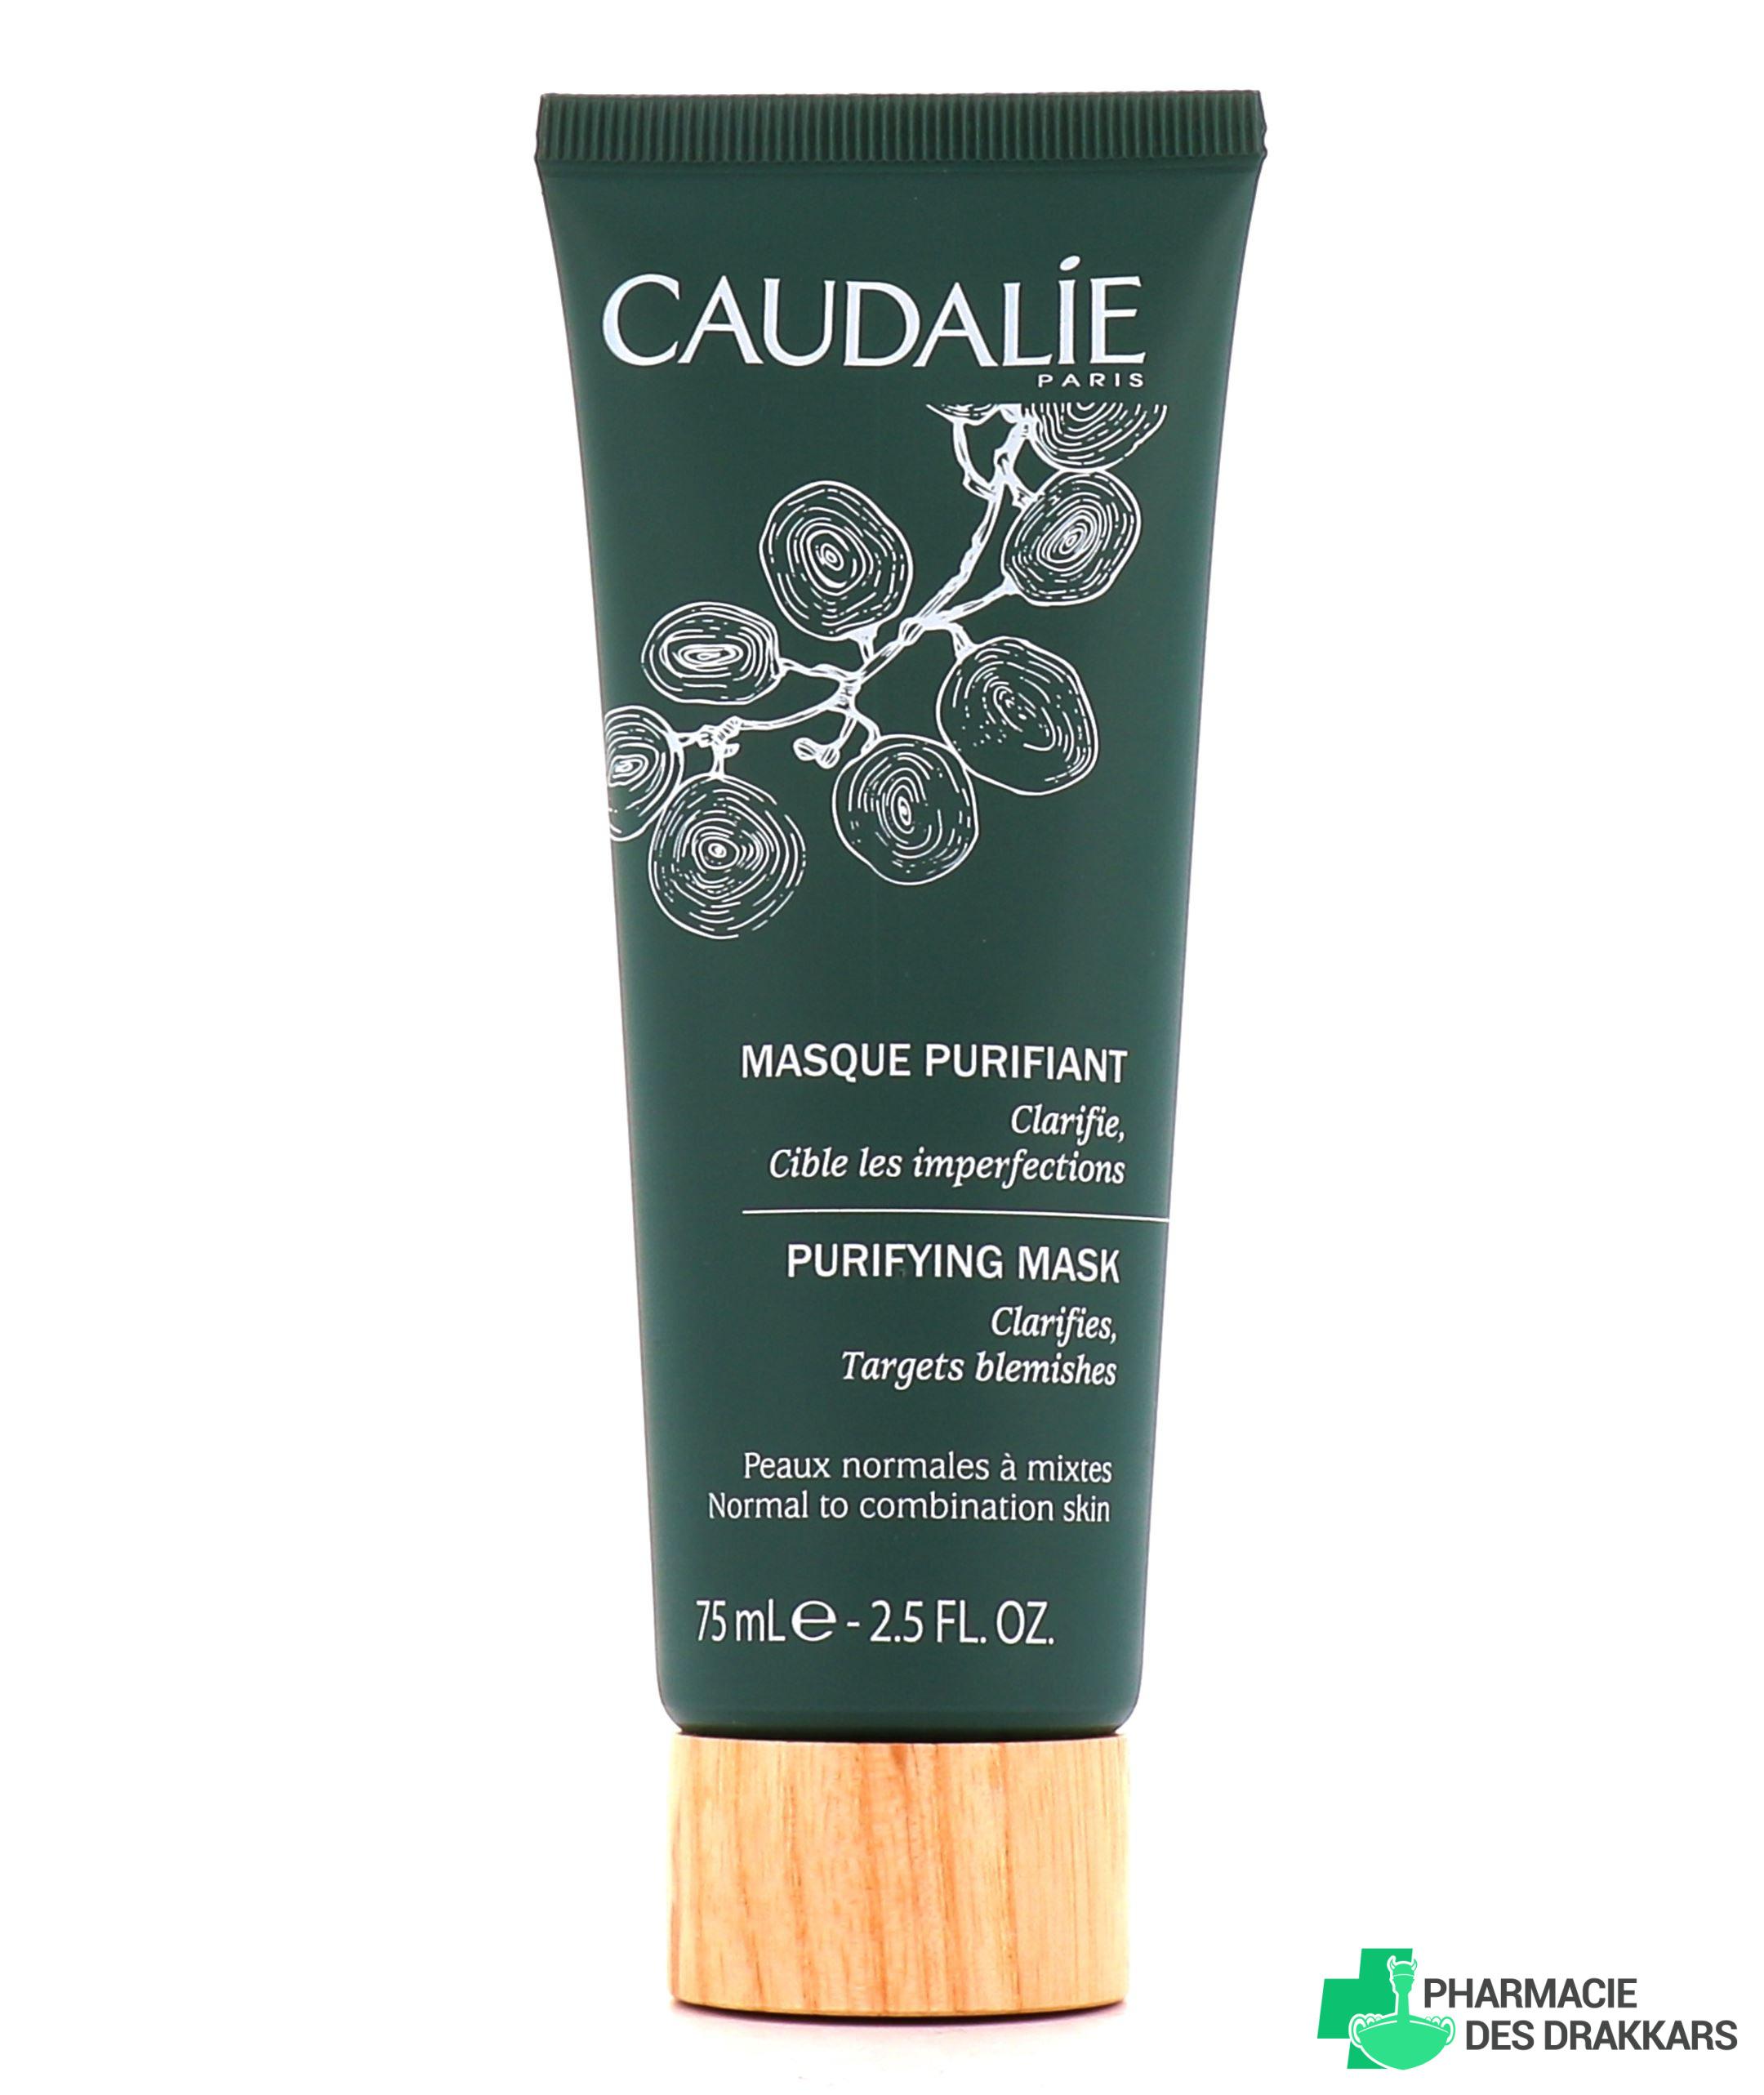 Masque purifiant 75 ml Caudalie - Caudalie | Pharmacie des ...